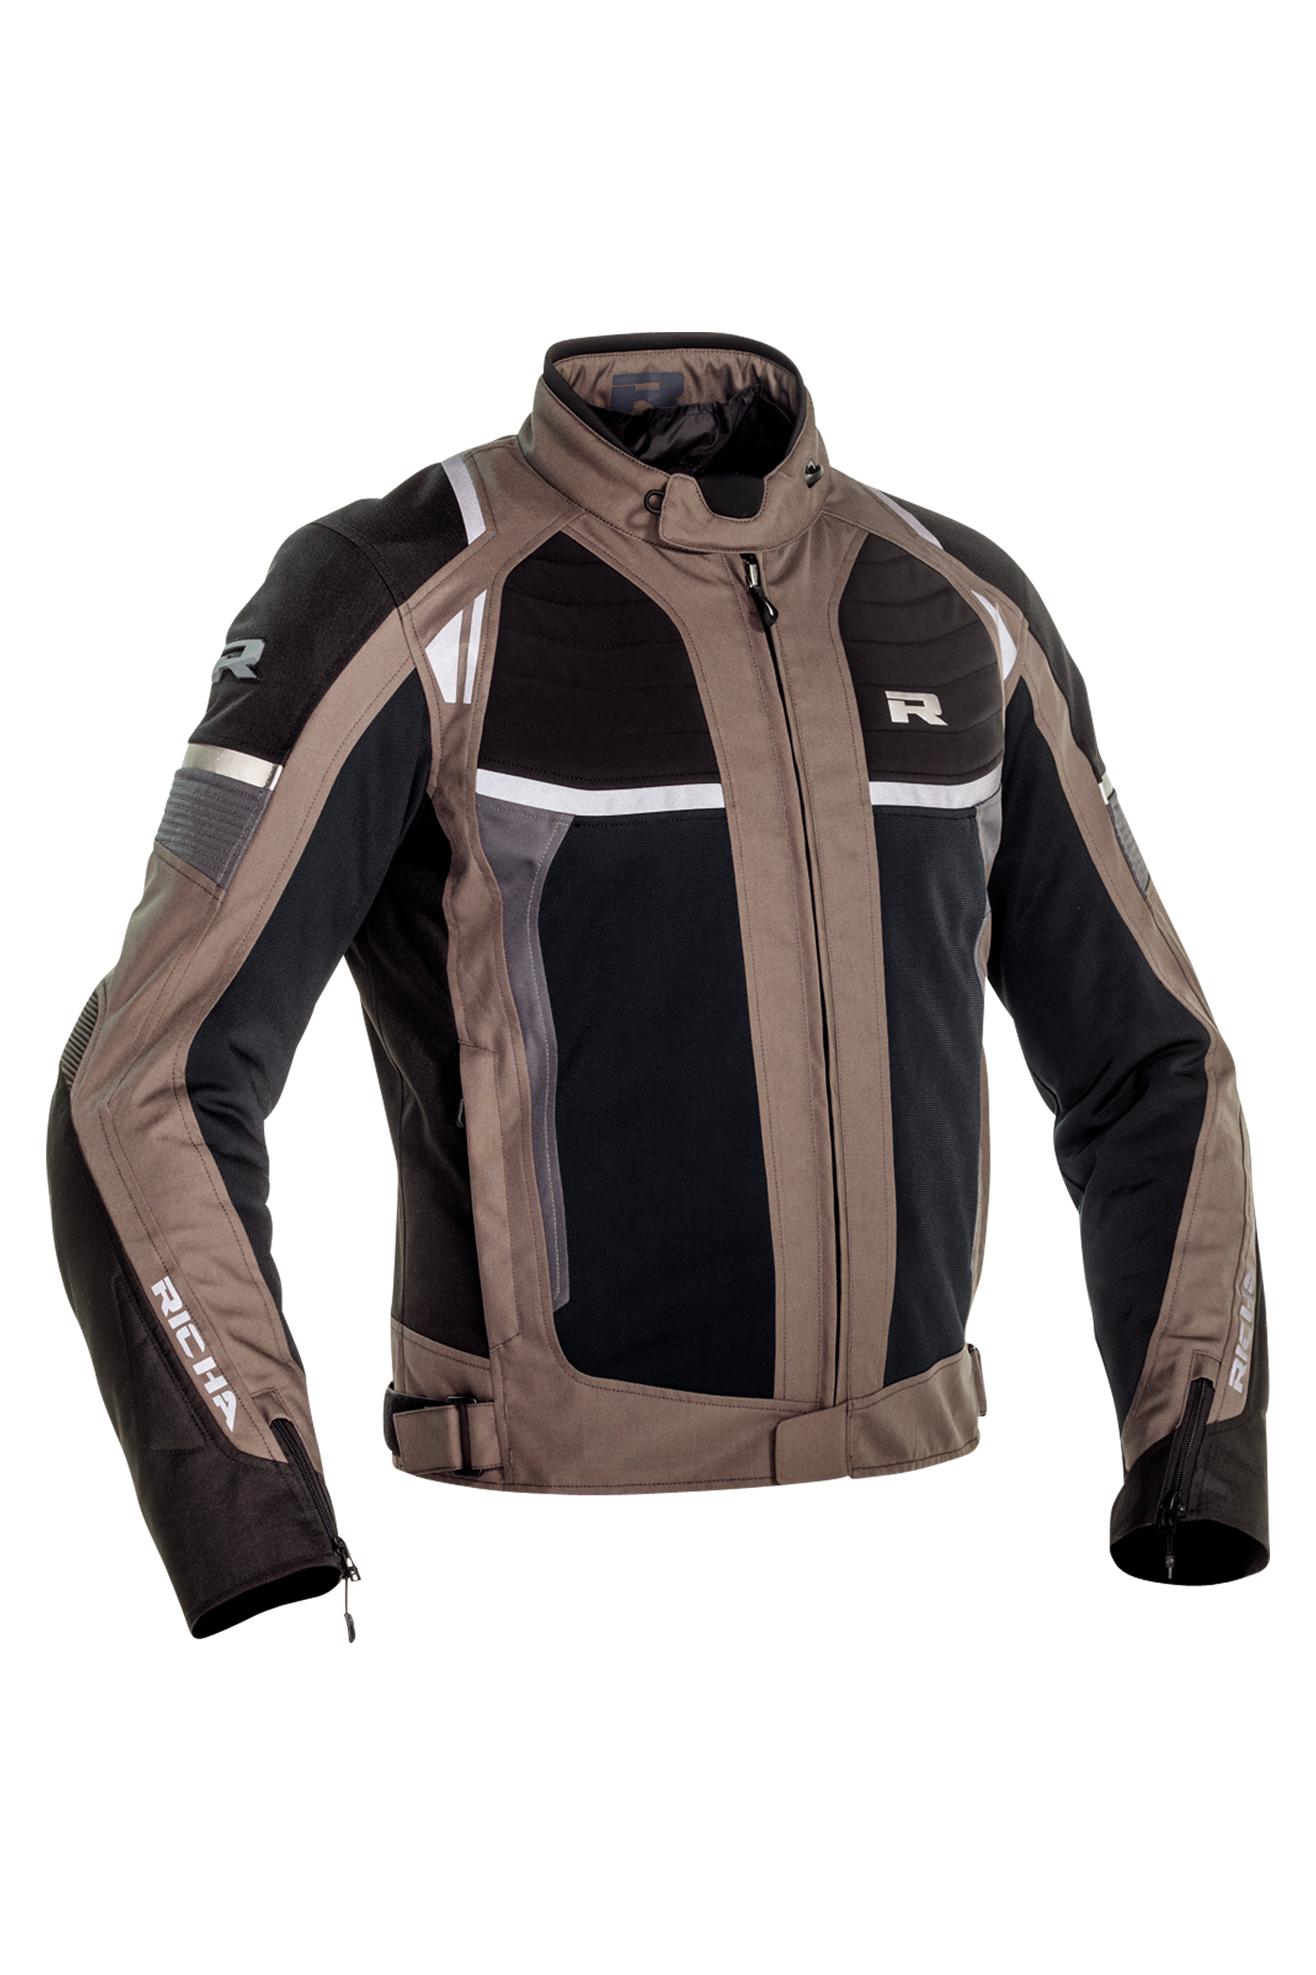 richa giacca moto  airstream-x marrone-beige